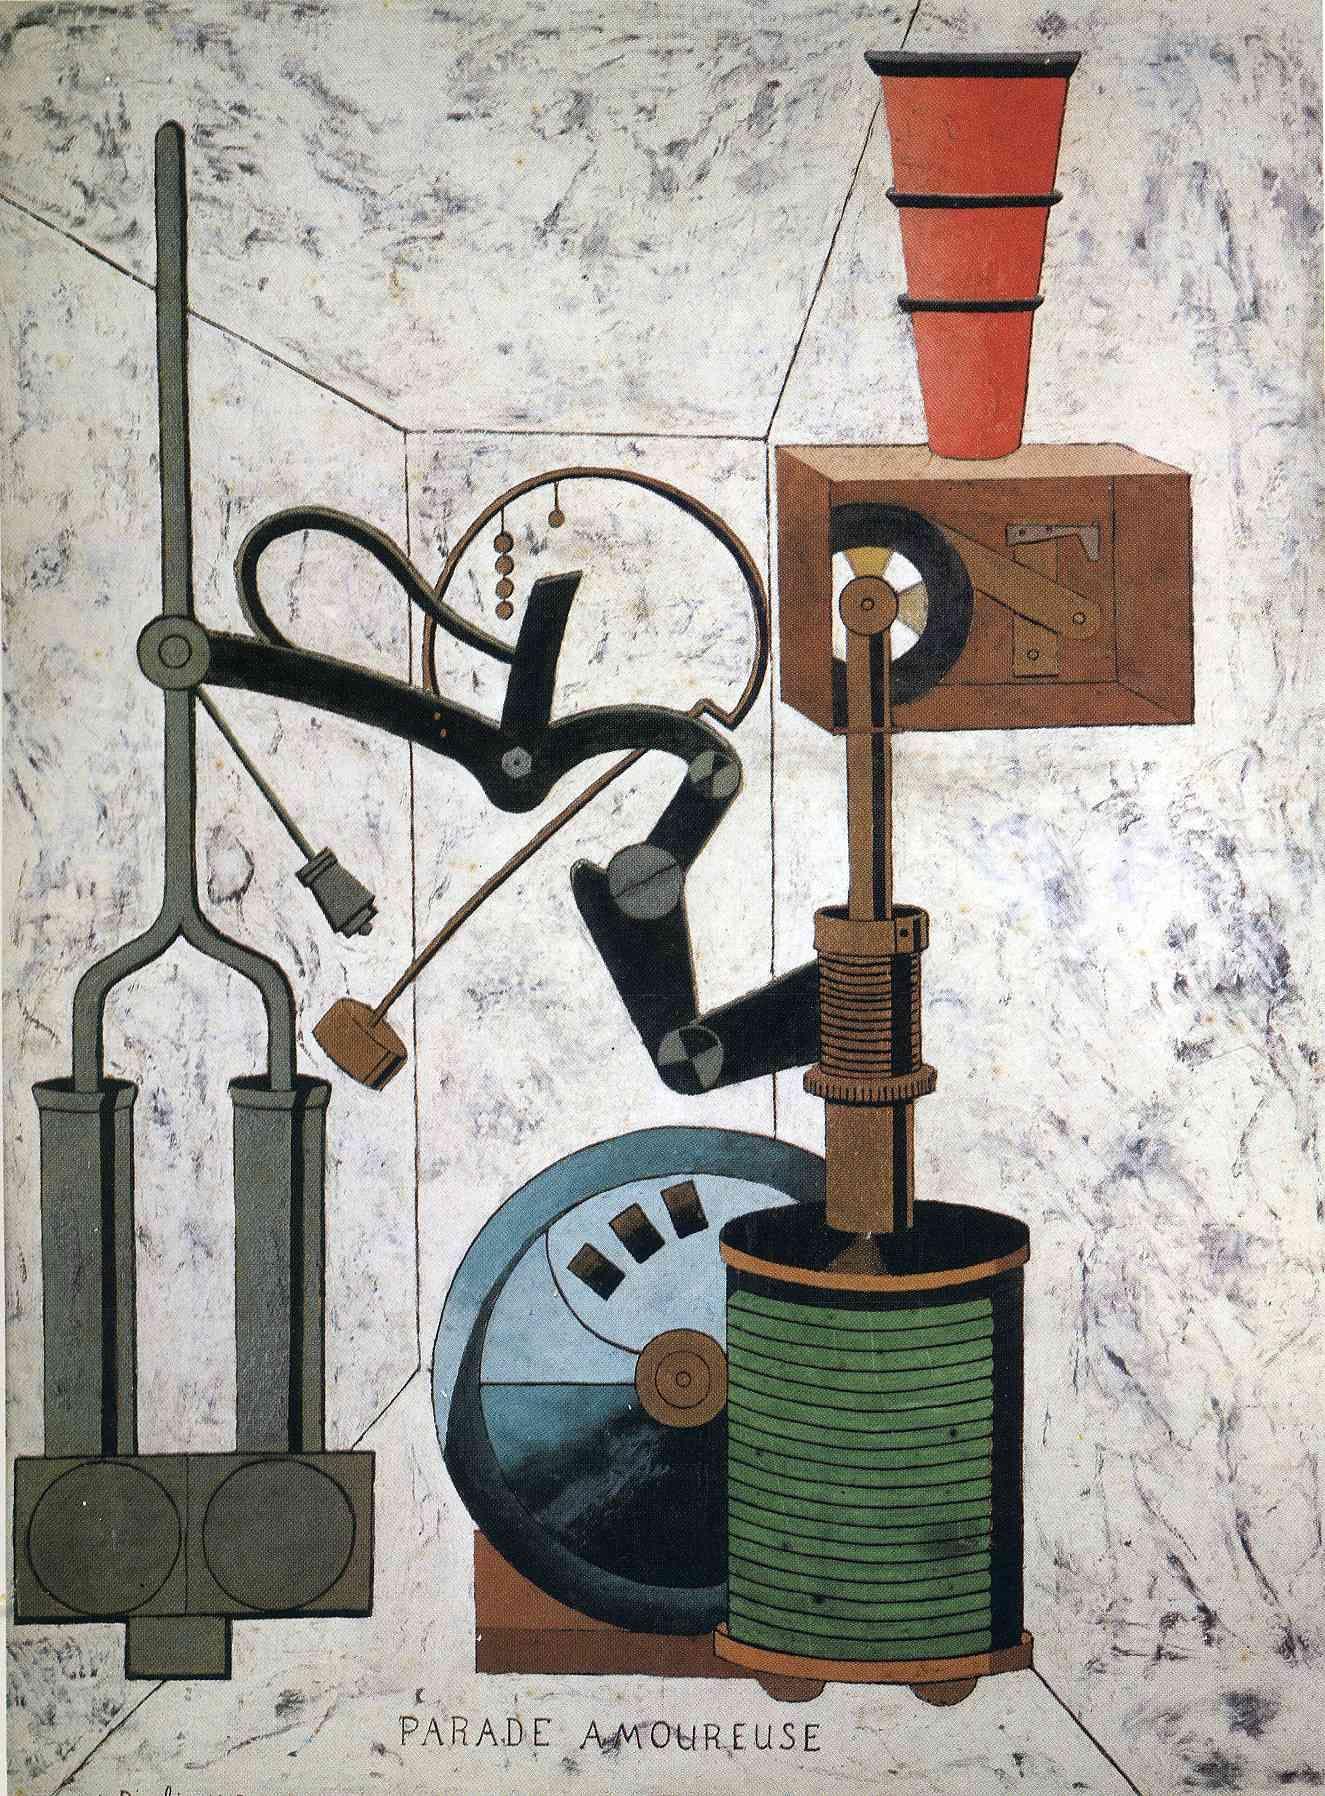 Liefdesparade ~ 1917 ~ Olieverf op karton ~ 96,5 x 73,7 cm. ~ Verzameling Morton G. Neumann, Chicago ~ © 2015 Artists Rights Society (ARS), New York / ADAGP, Paris